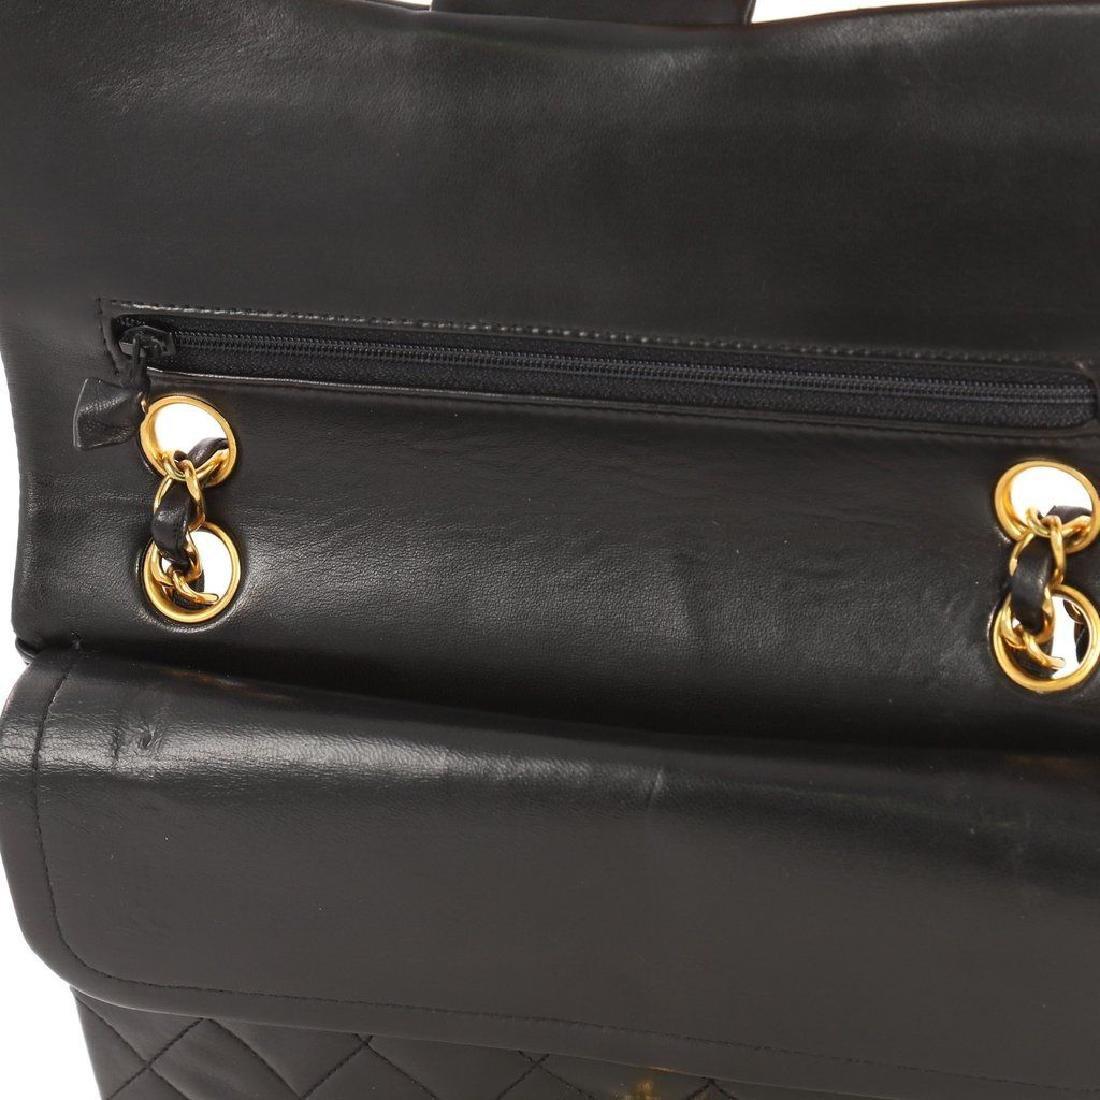 Chanel Double Flap Classic Shoulder Bag Black Lambskin - 6